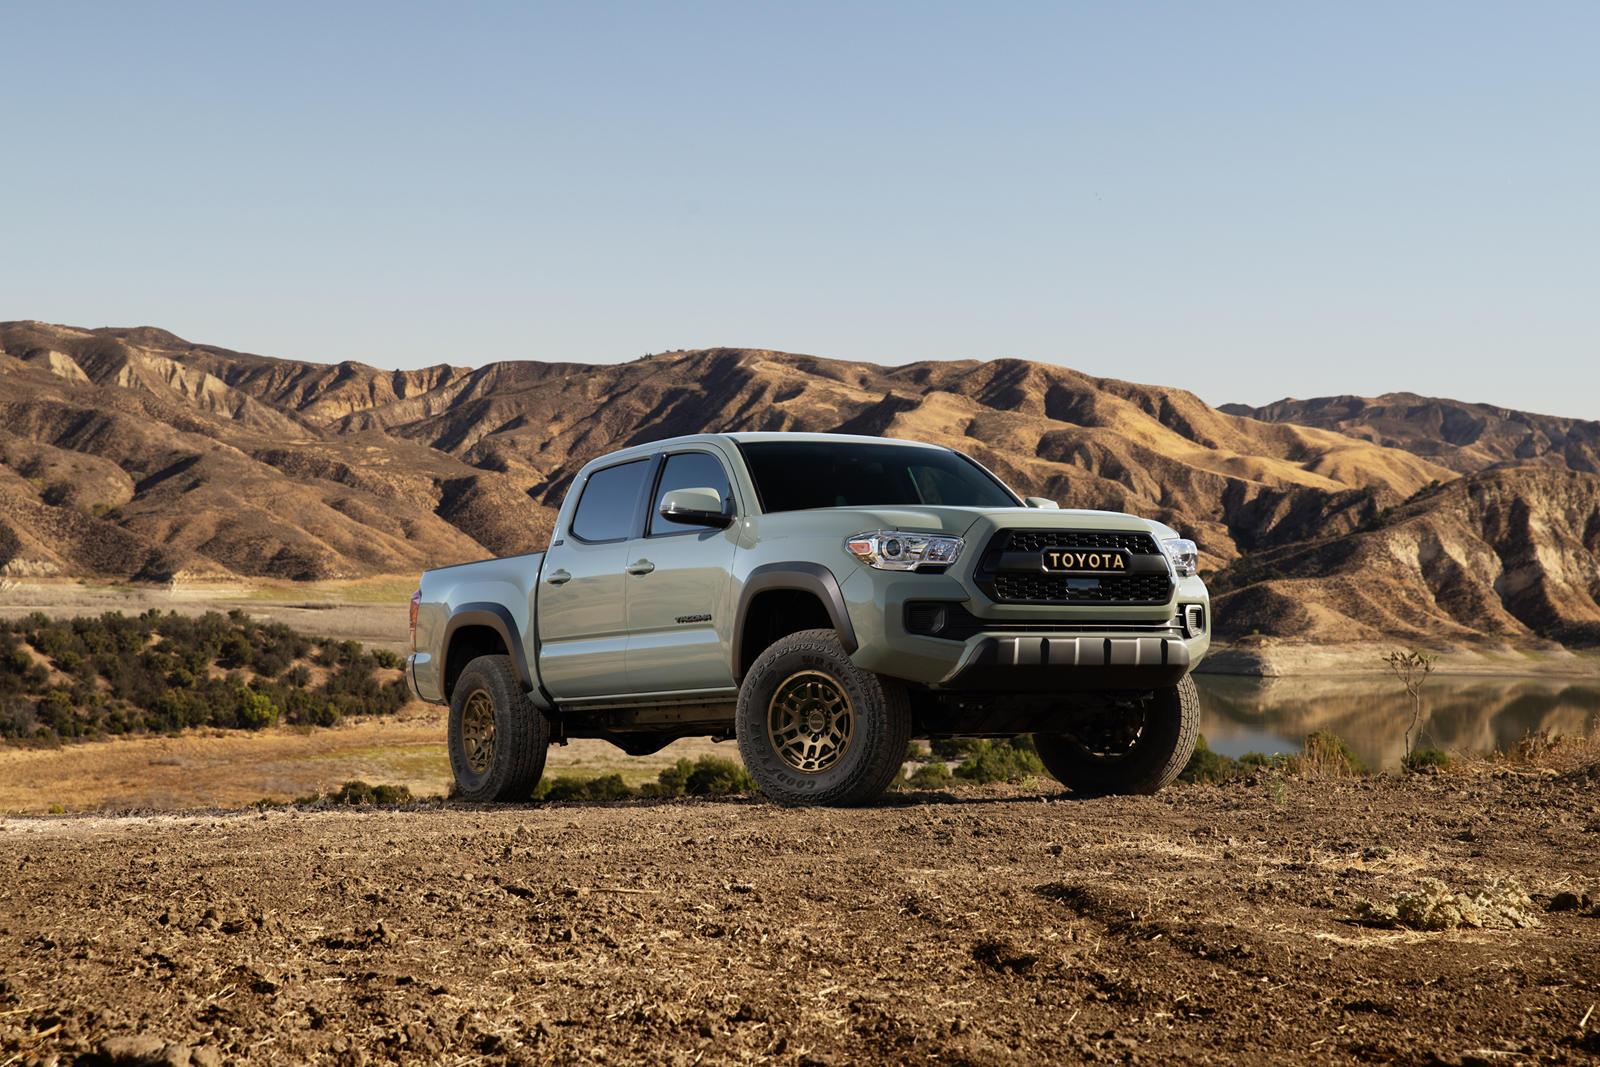 Toyota-Tacoma-Trail-Edition-bán-tải-off-road-giá-rẻ (5).jpg